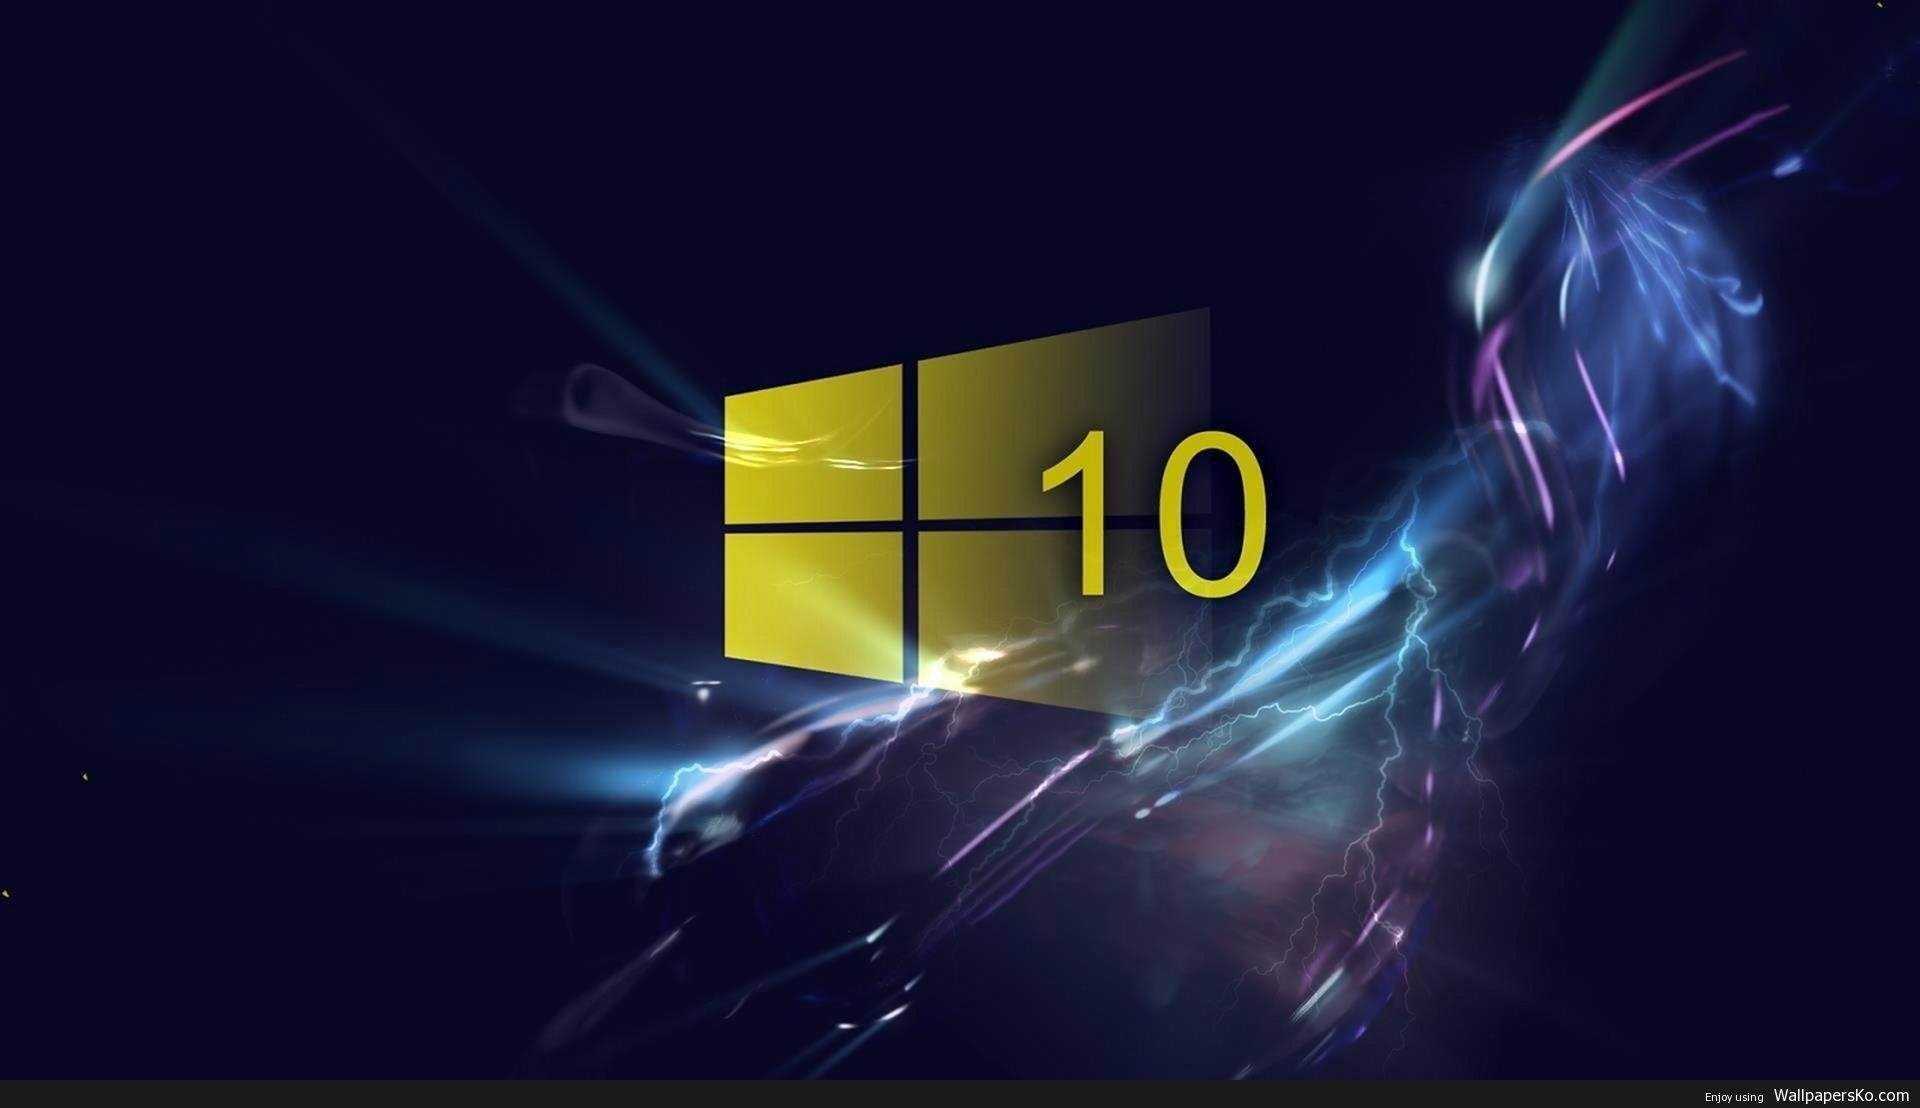 Windows 10 Background Wallpaper Free Download